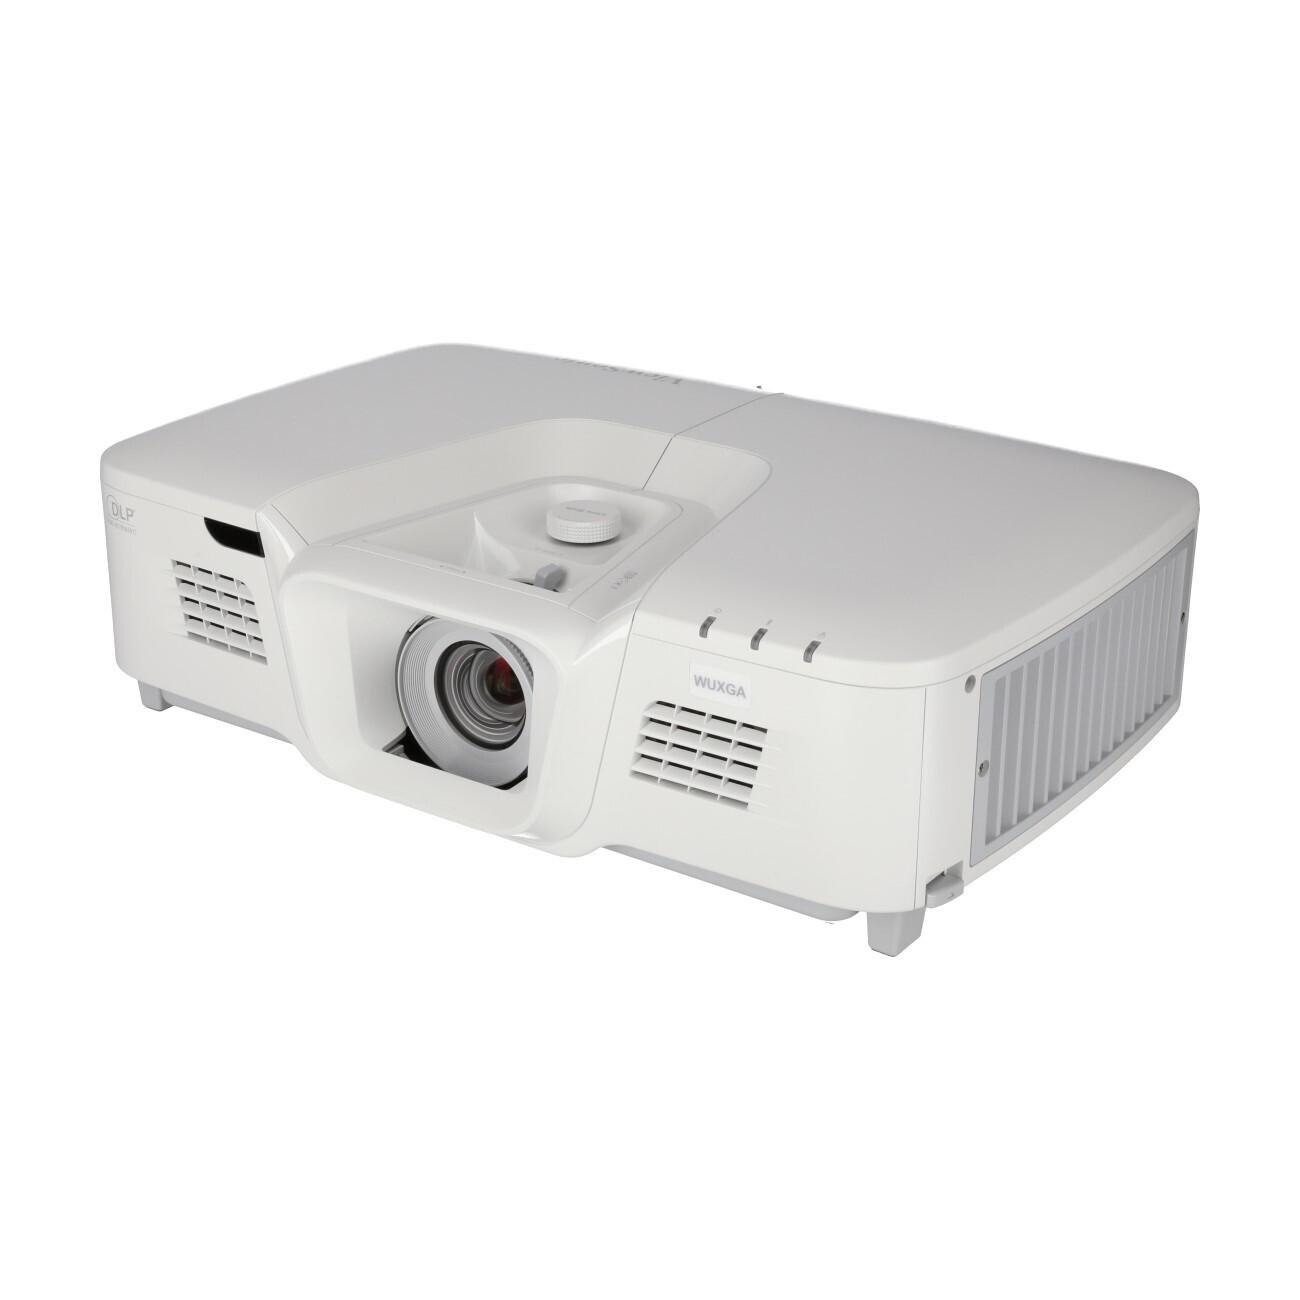 ViewSonic PRO8800WUL Business Beamer mit 5200 ANSI-Lumen und WUXGA